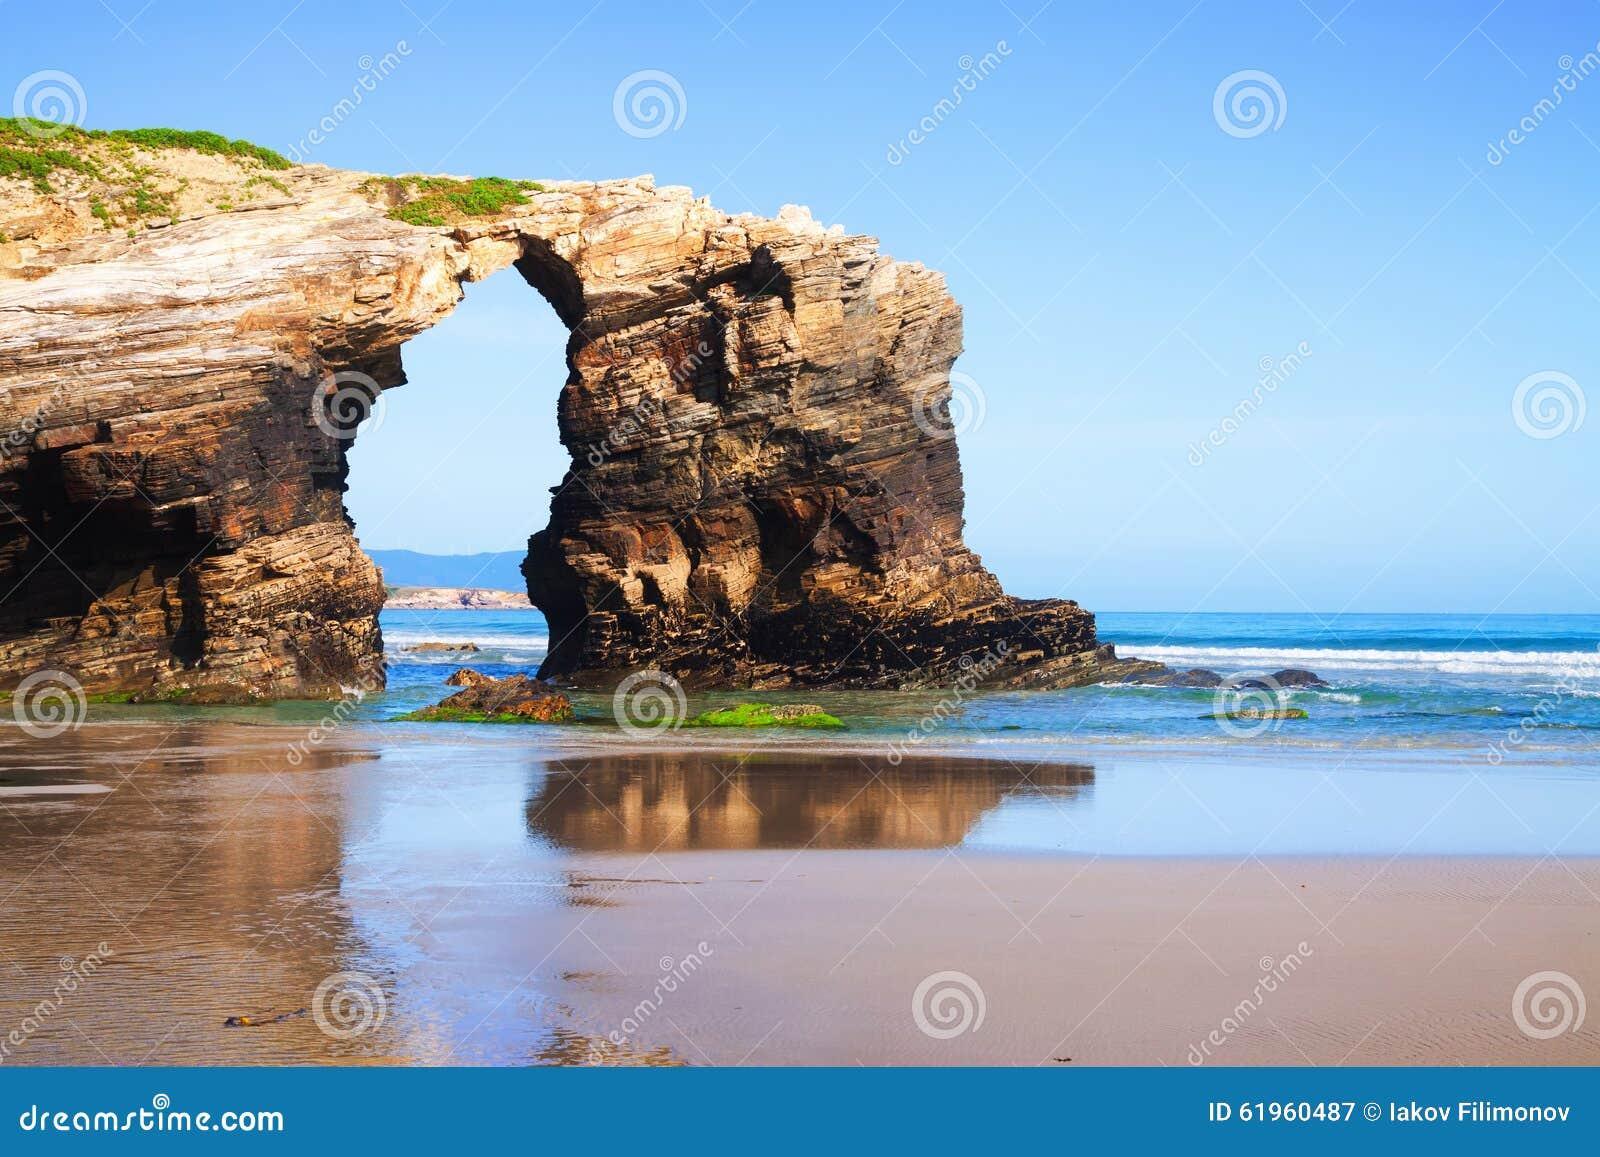 beach - it is the turistic name of Praia de Augas Santas (Beach ...